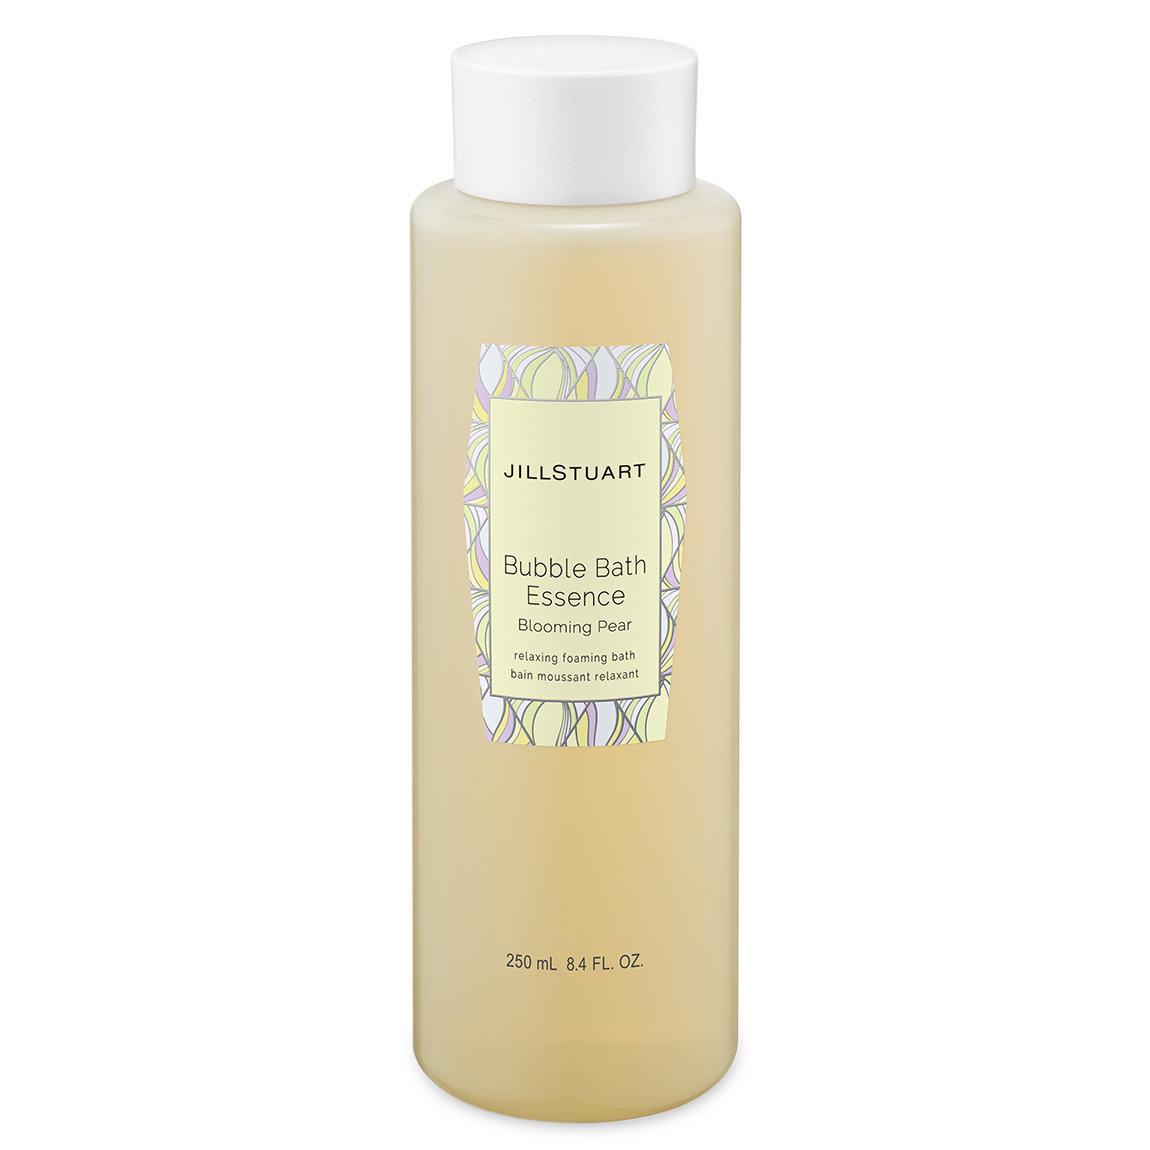 JILL STUART Beauty Bubble Bath Essence Blooming Pear alternative view 1 - product swatch.